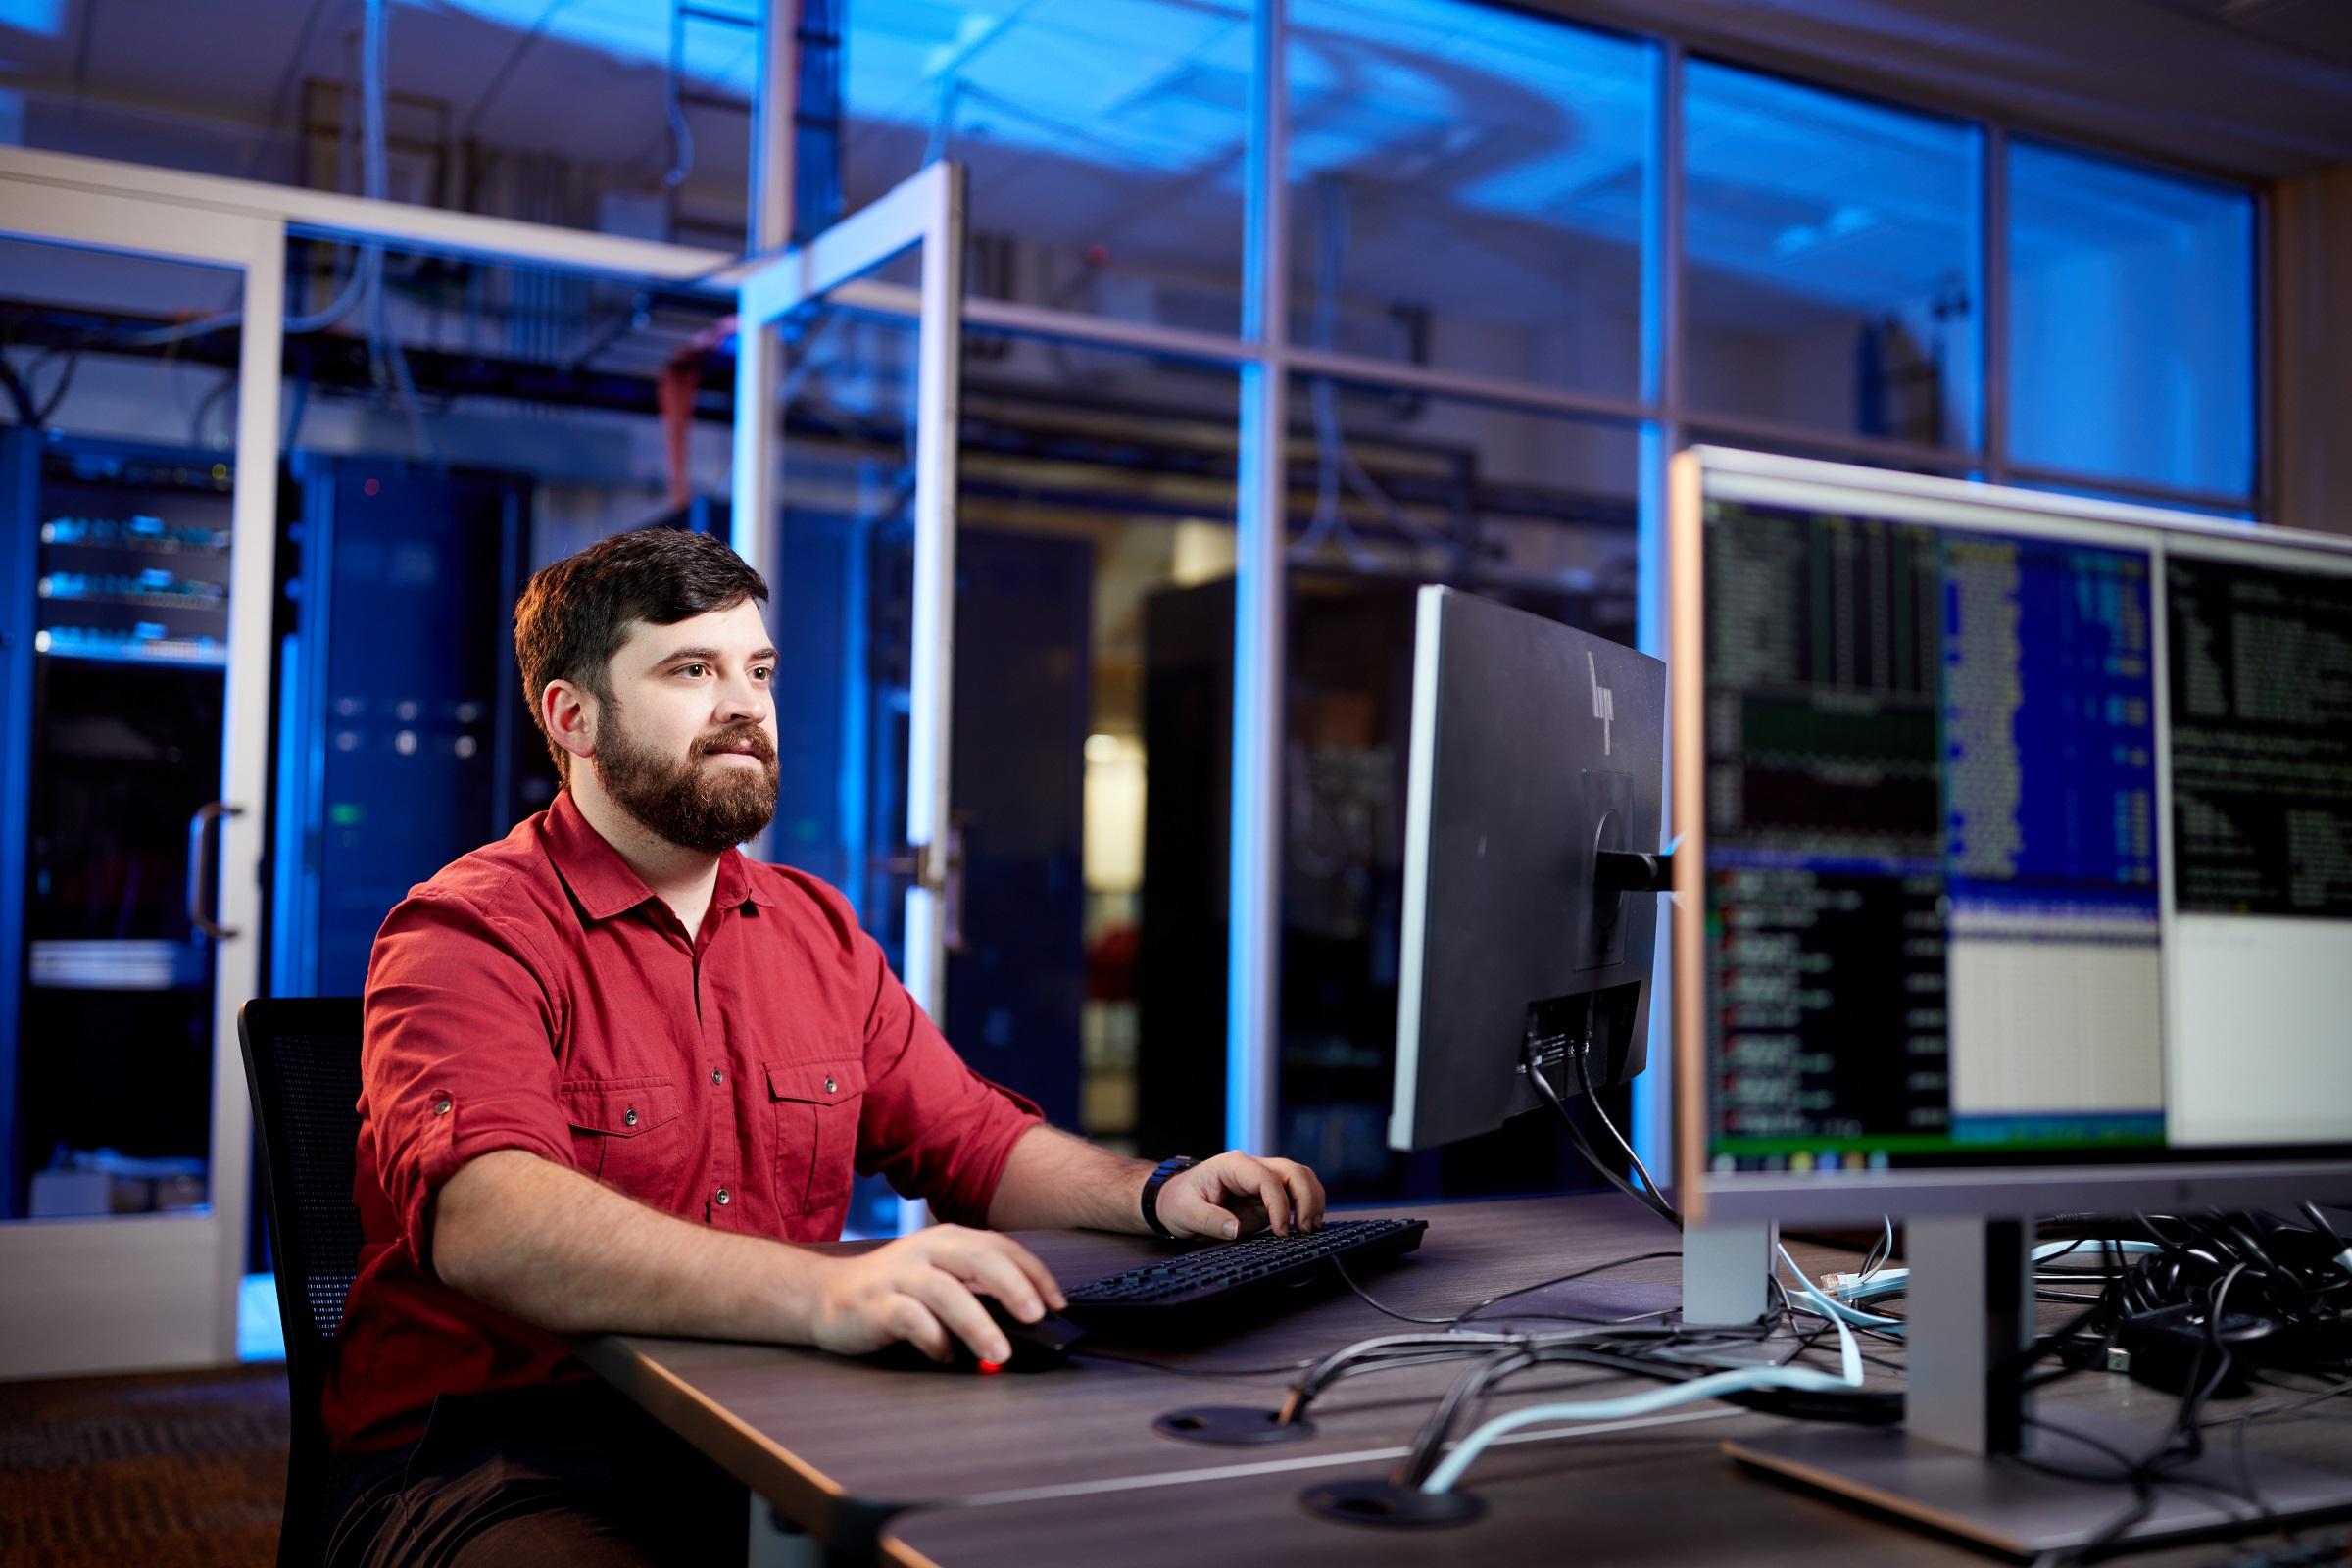 Bachelors Computational Mathematics Computer Science Degree